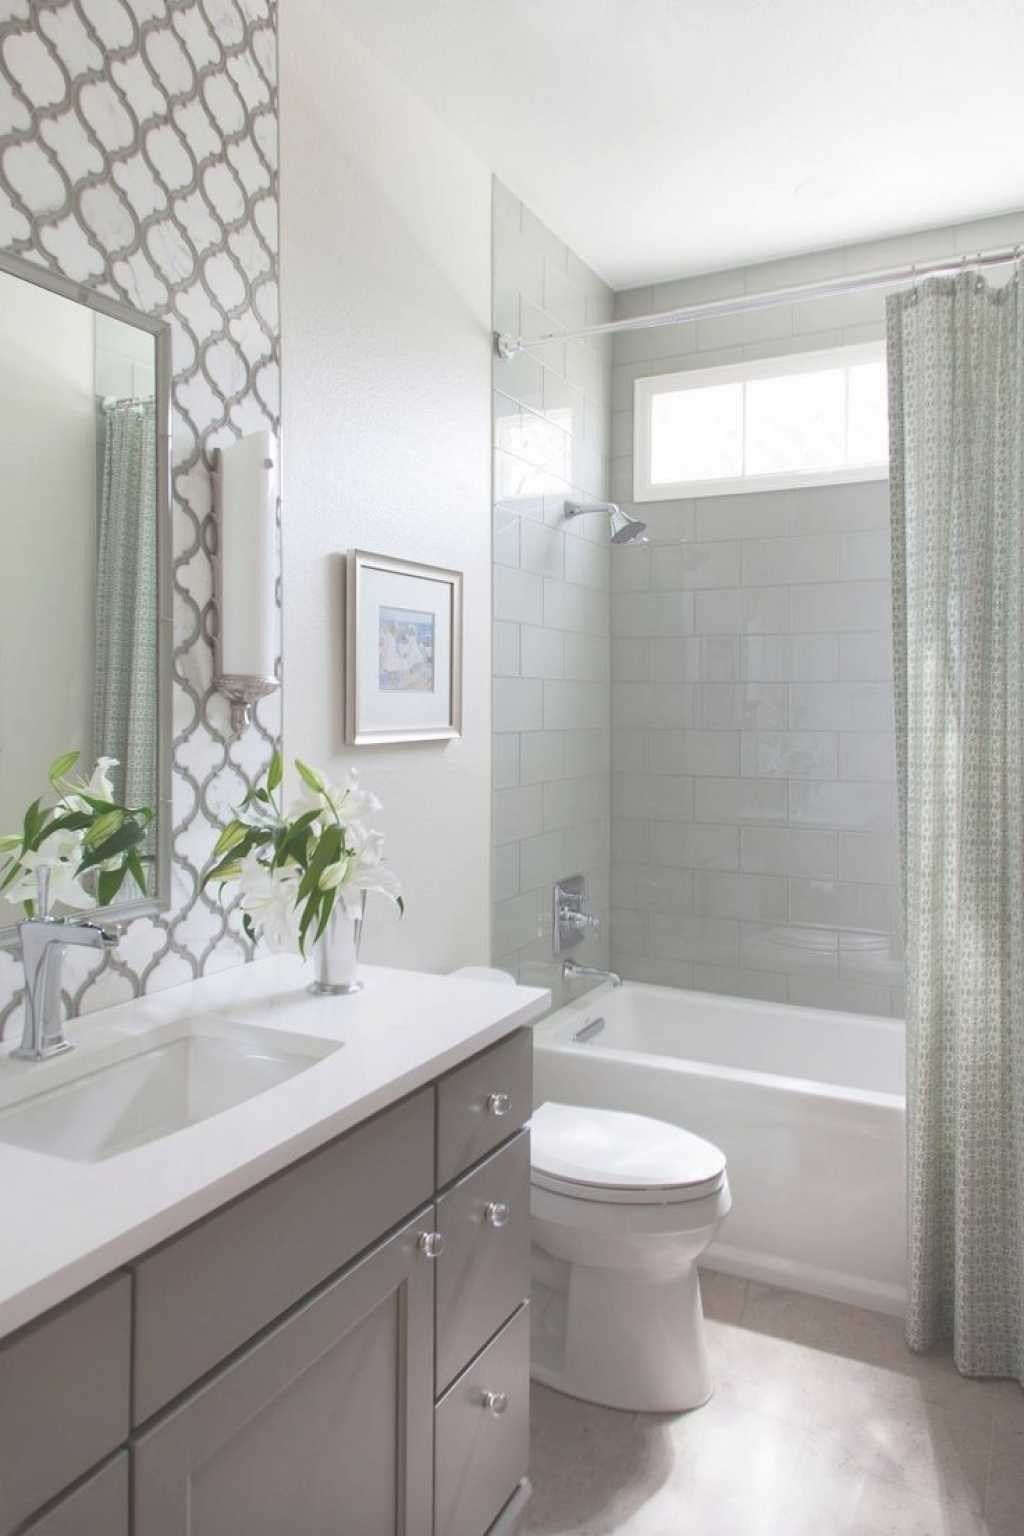 Pin By Room Crafts Projects On Decoracion Del Hogar In 2020 Small Bathroom Renovations Bathroom Tub Shower Combo Bathroom Design Small